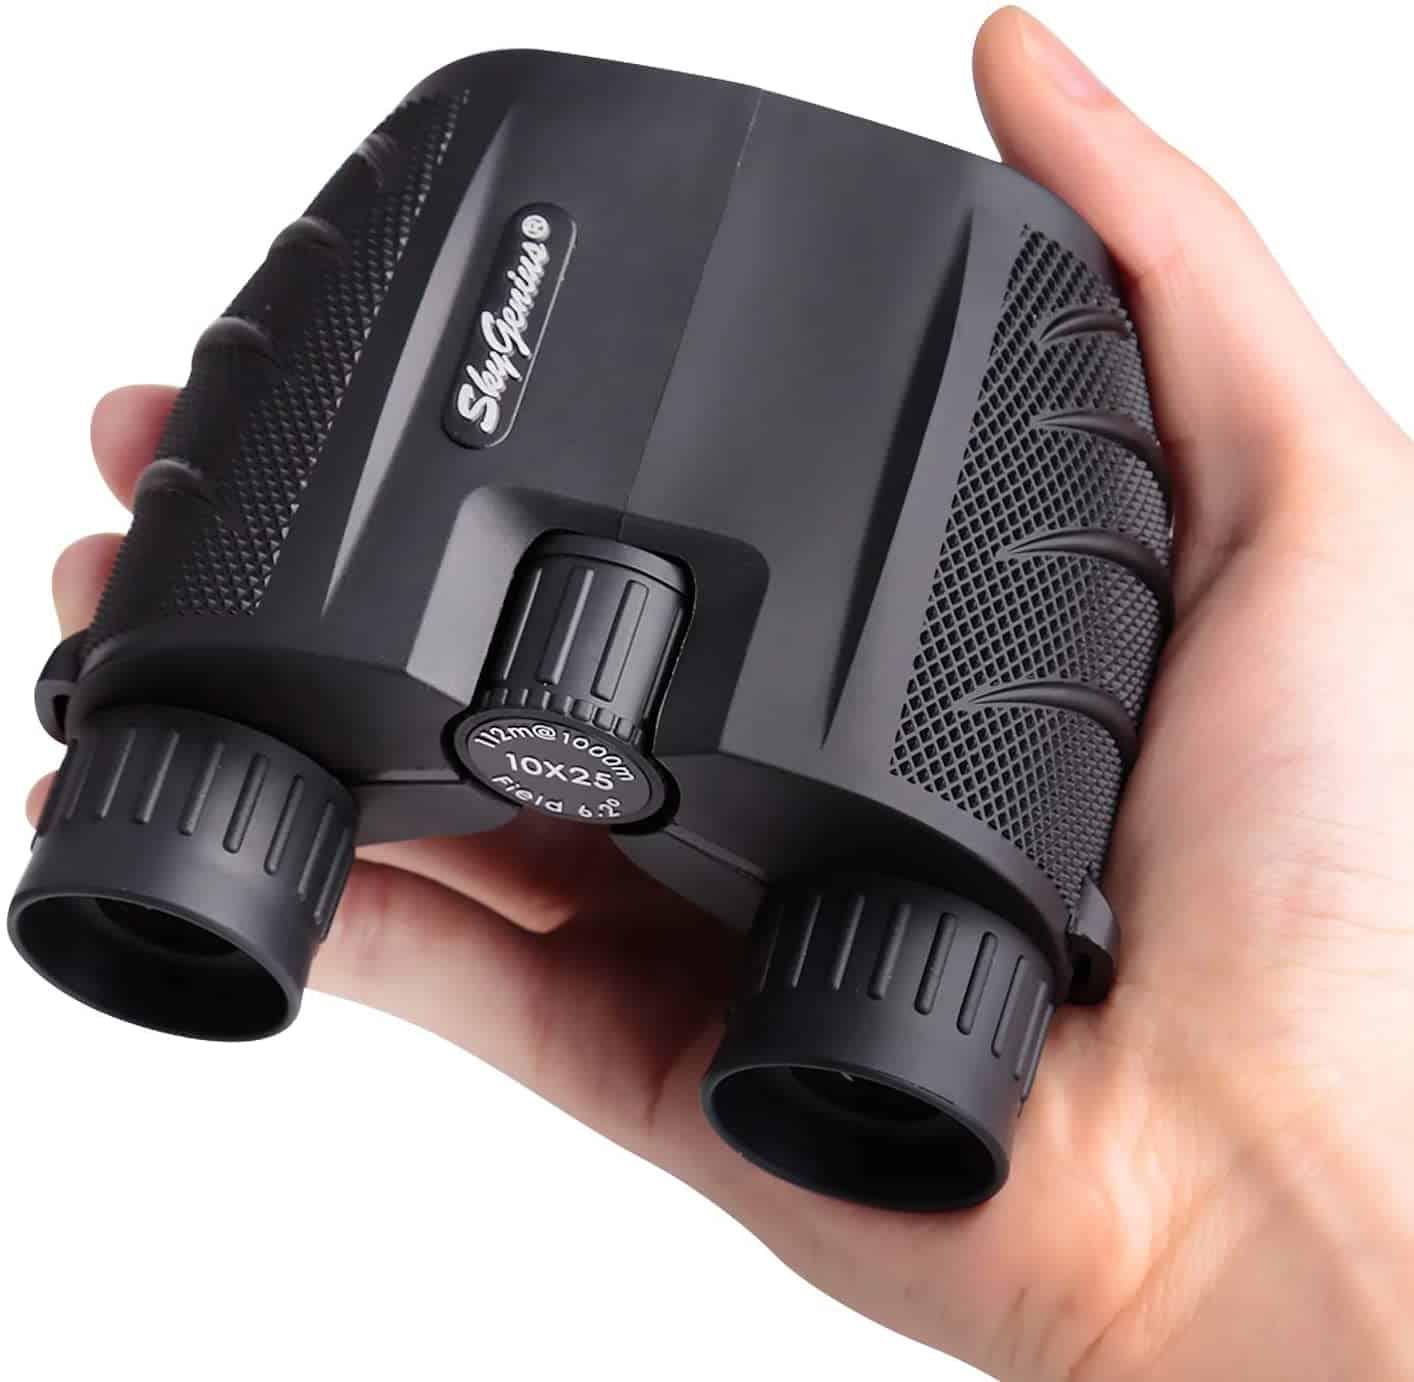 SkyGenius 10×25 Compact Binoculars